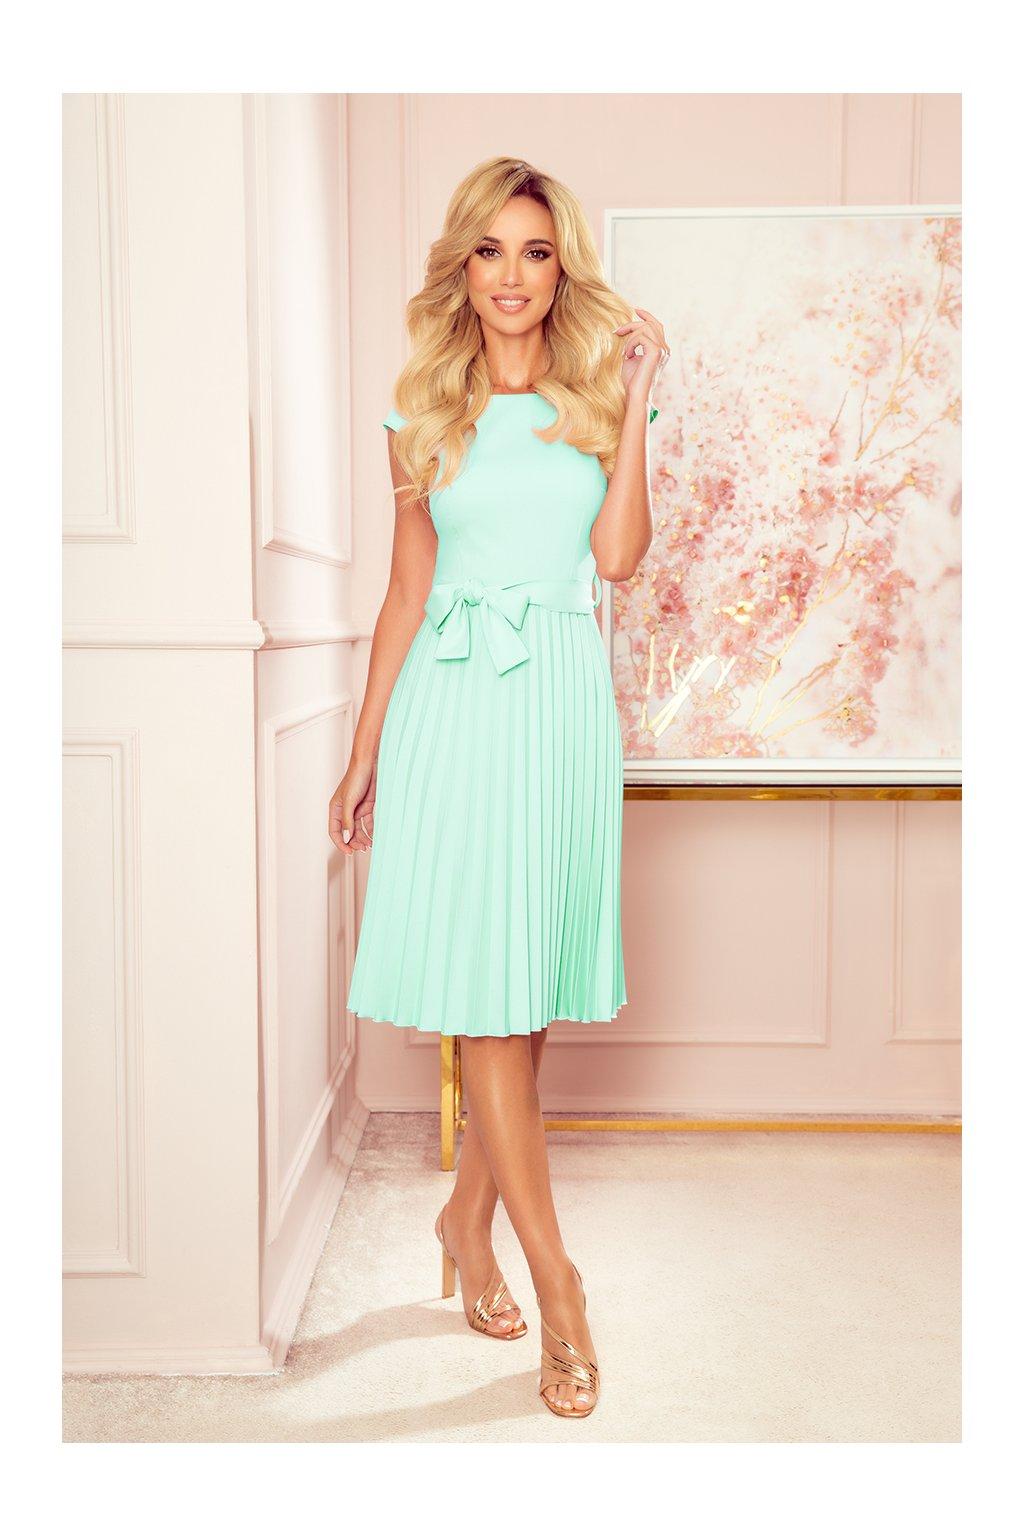 311 9 lila plisowana sukienka 12214